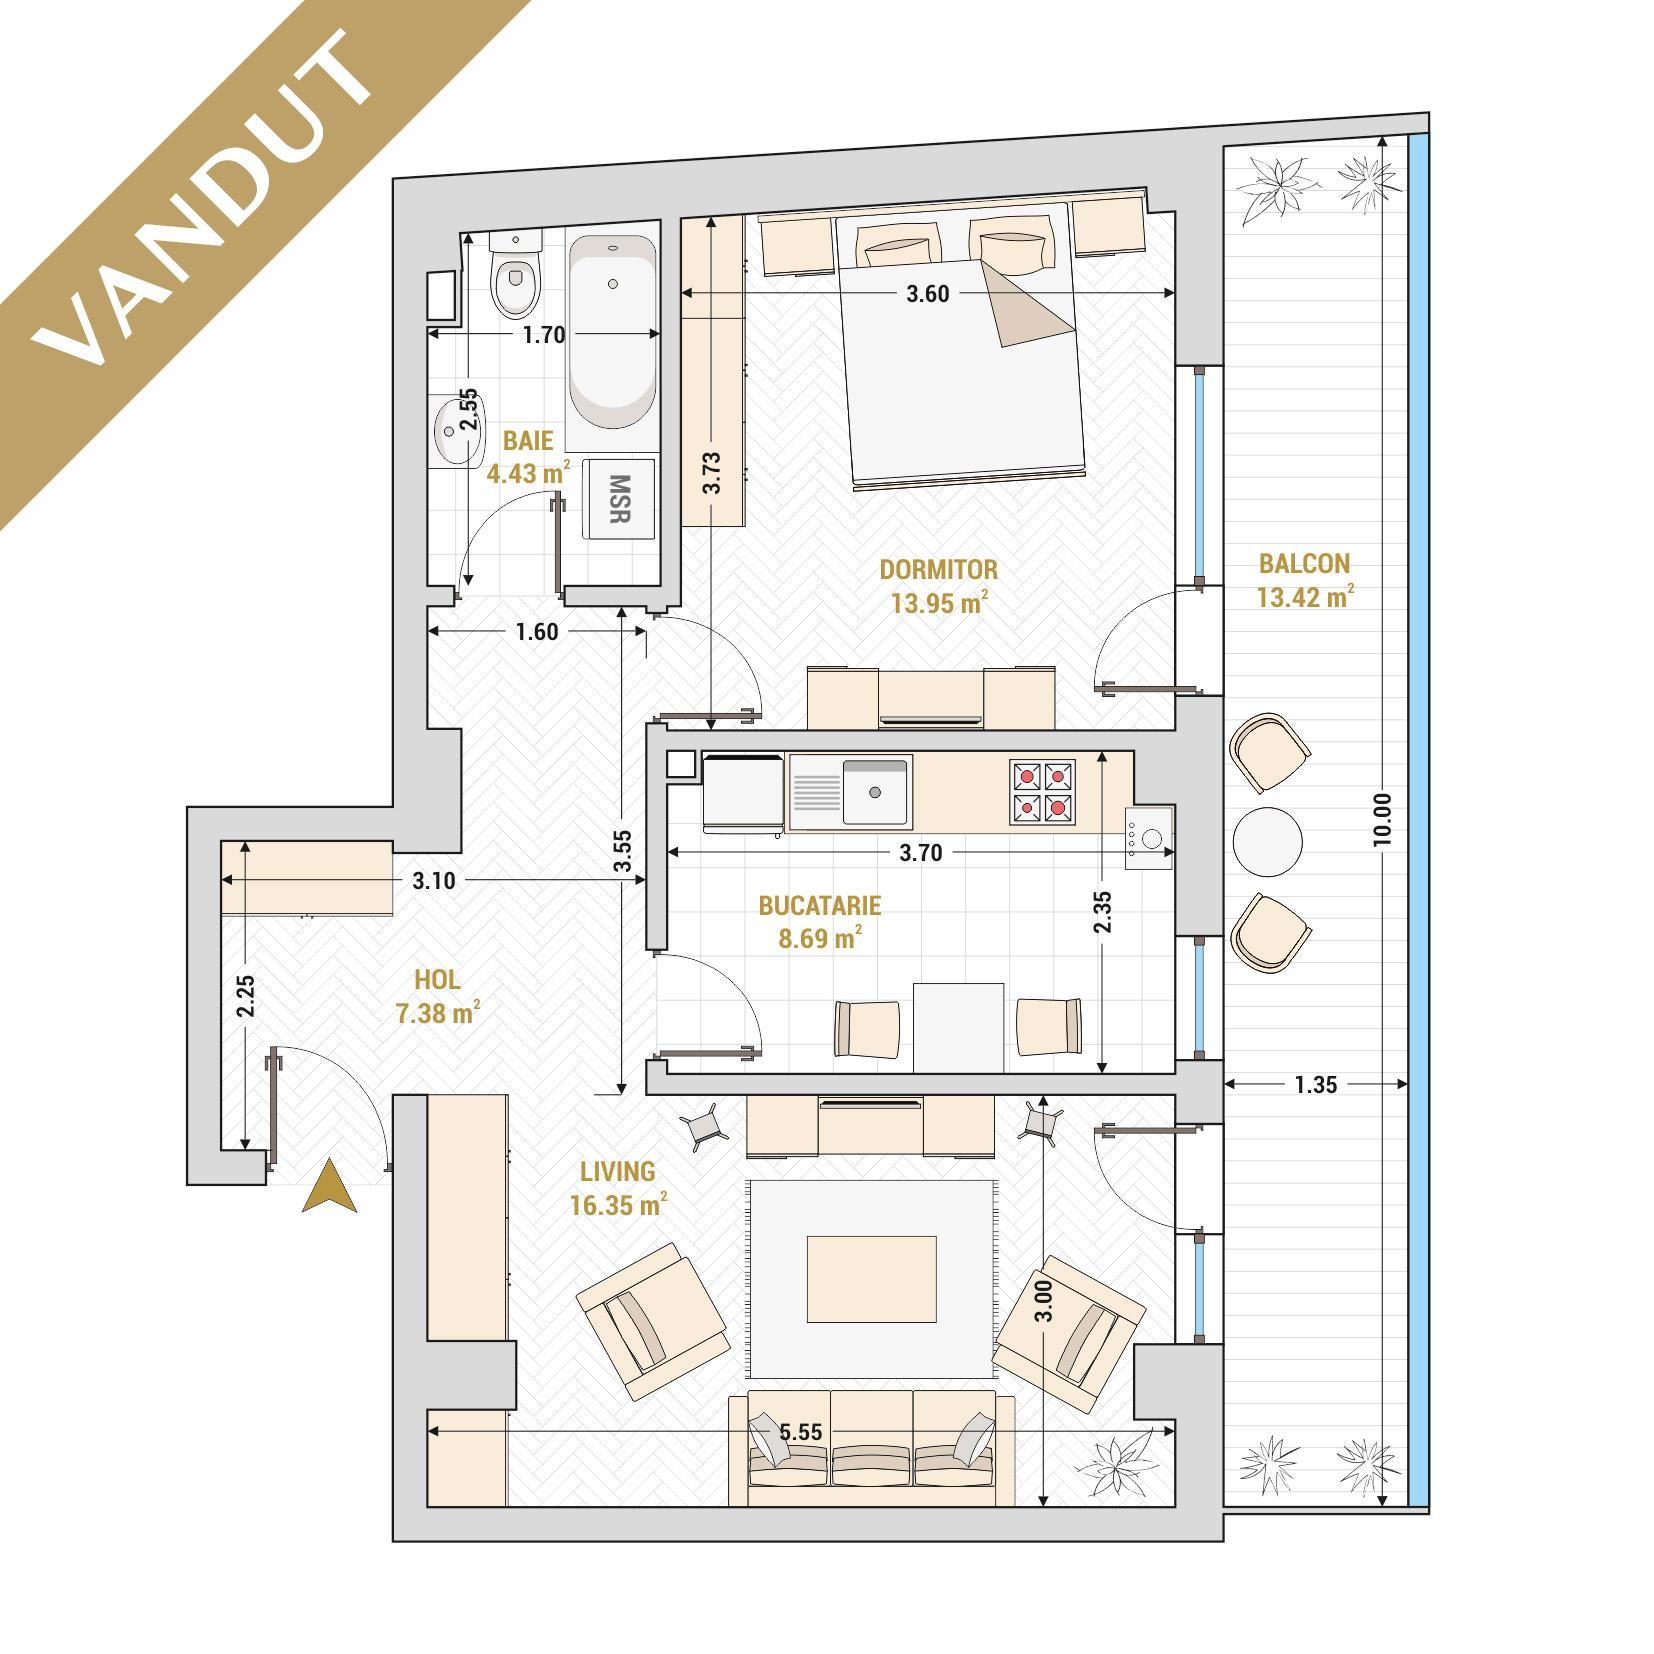 Apartament 2 camere de vanzare Bucuresti - Catedral Residence - Marriott, Piata Unirii, 13 Septembrie, Izvor - Tip 3 - T2 - V